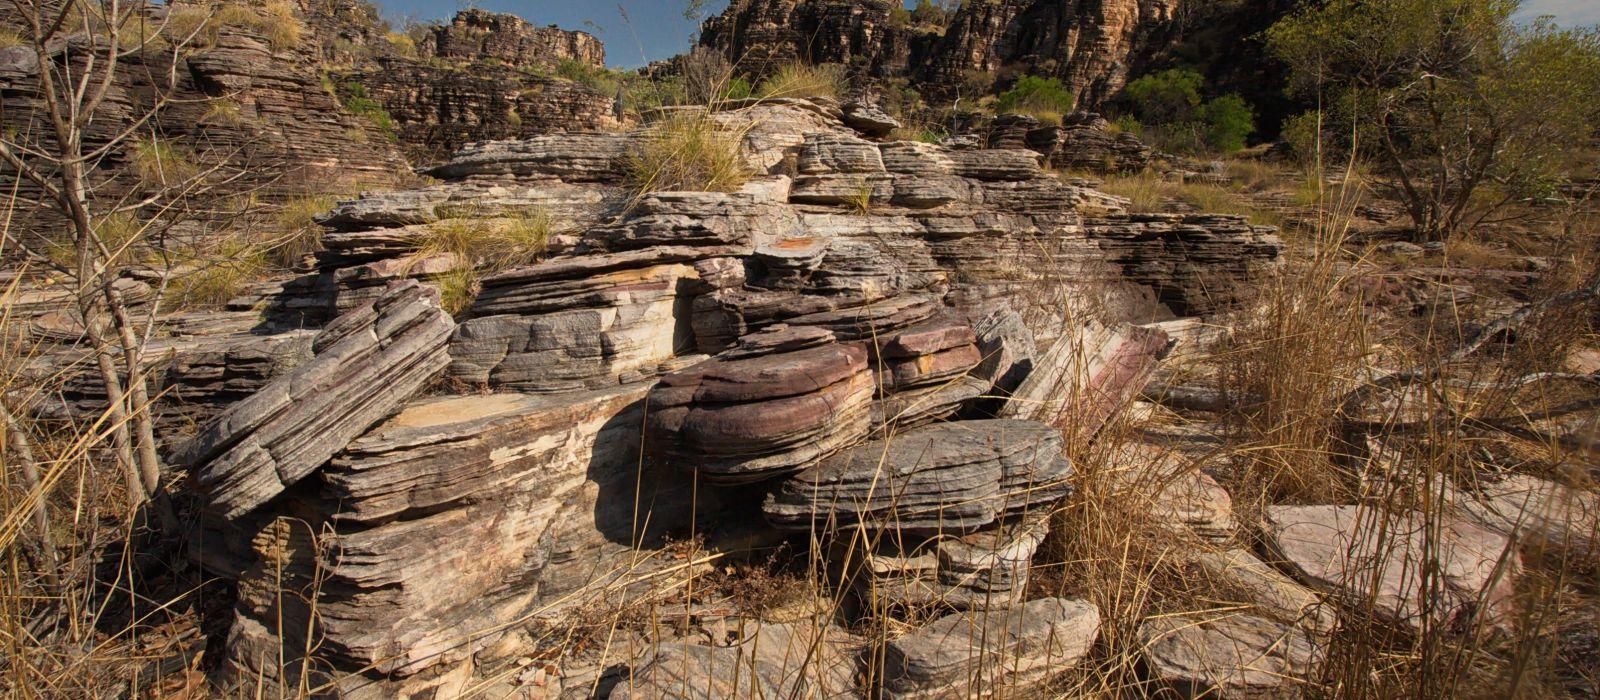 Reiseziel Jabiru Australien